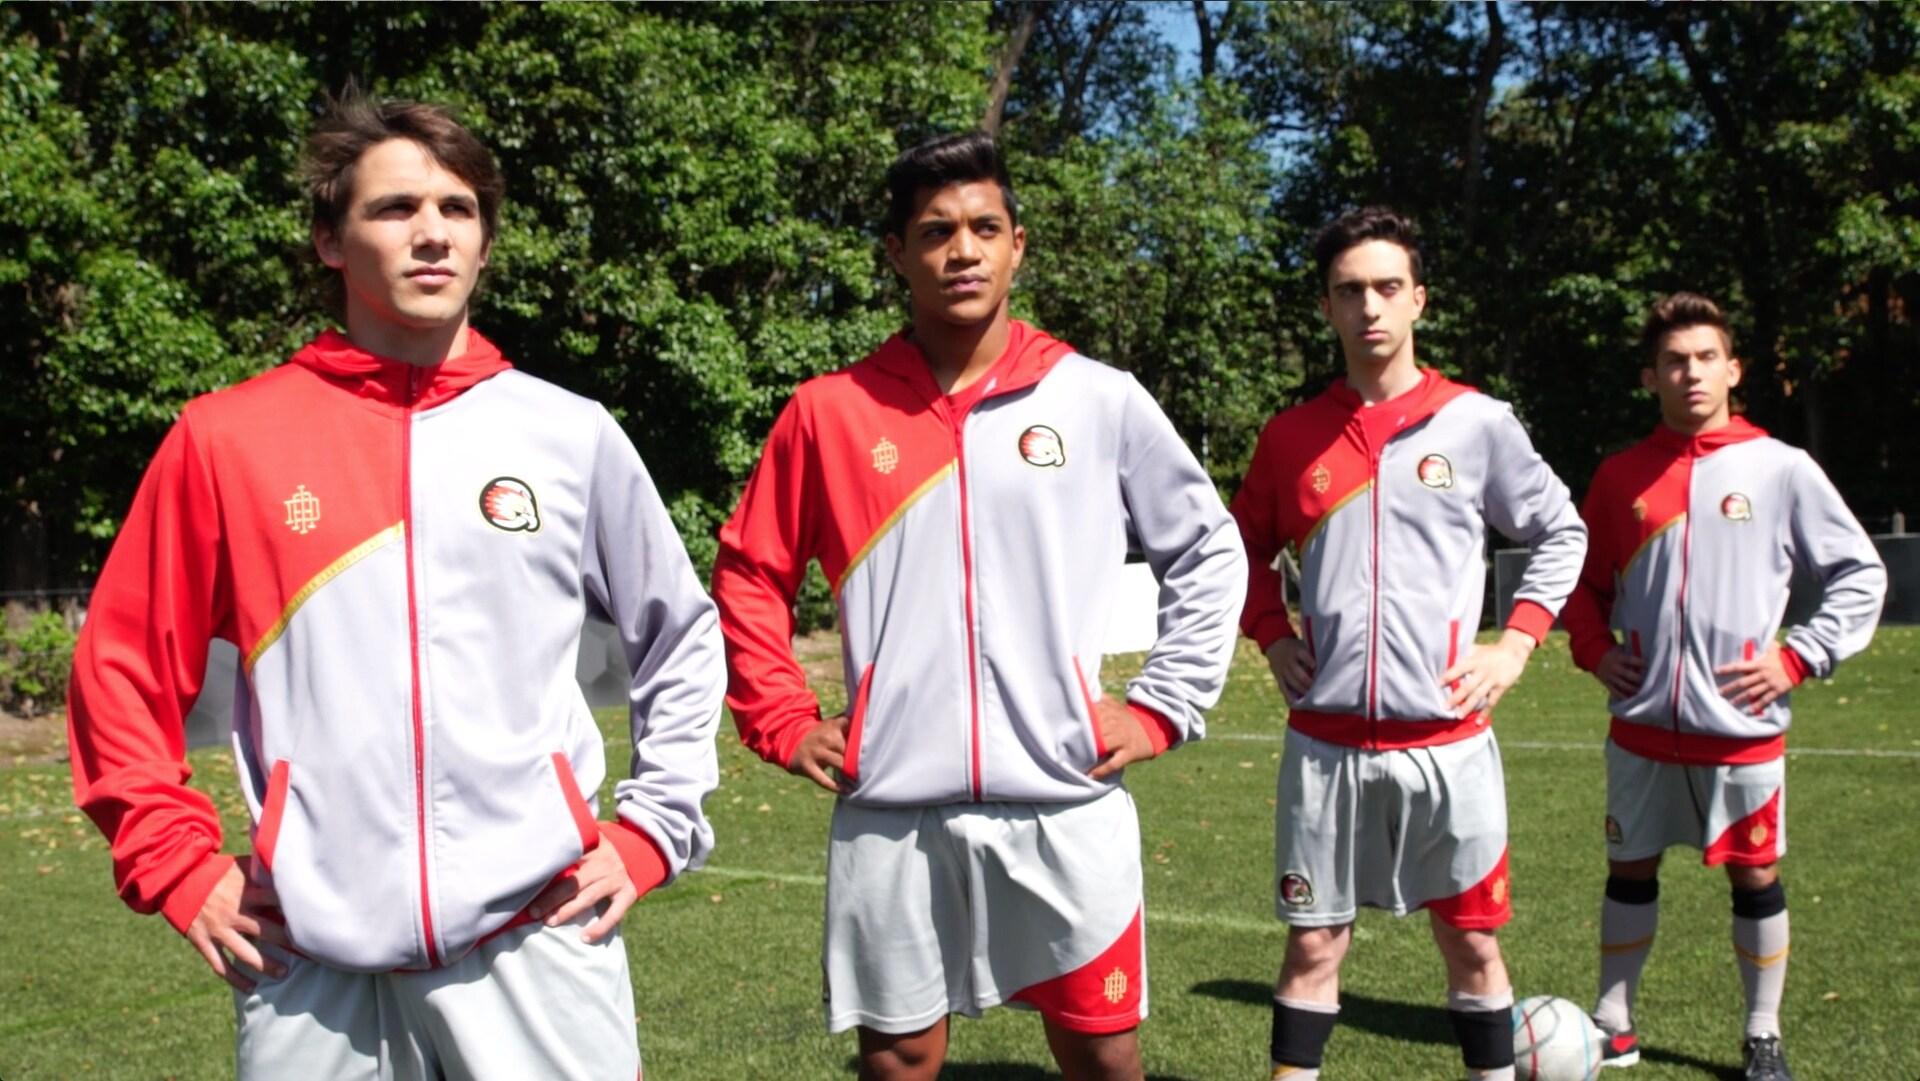 O11CE Challenges: Goles olímpicos - Gabo, Joaquín, Adrián y Mariano